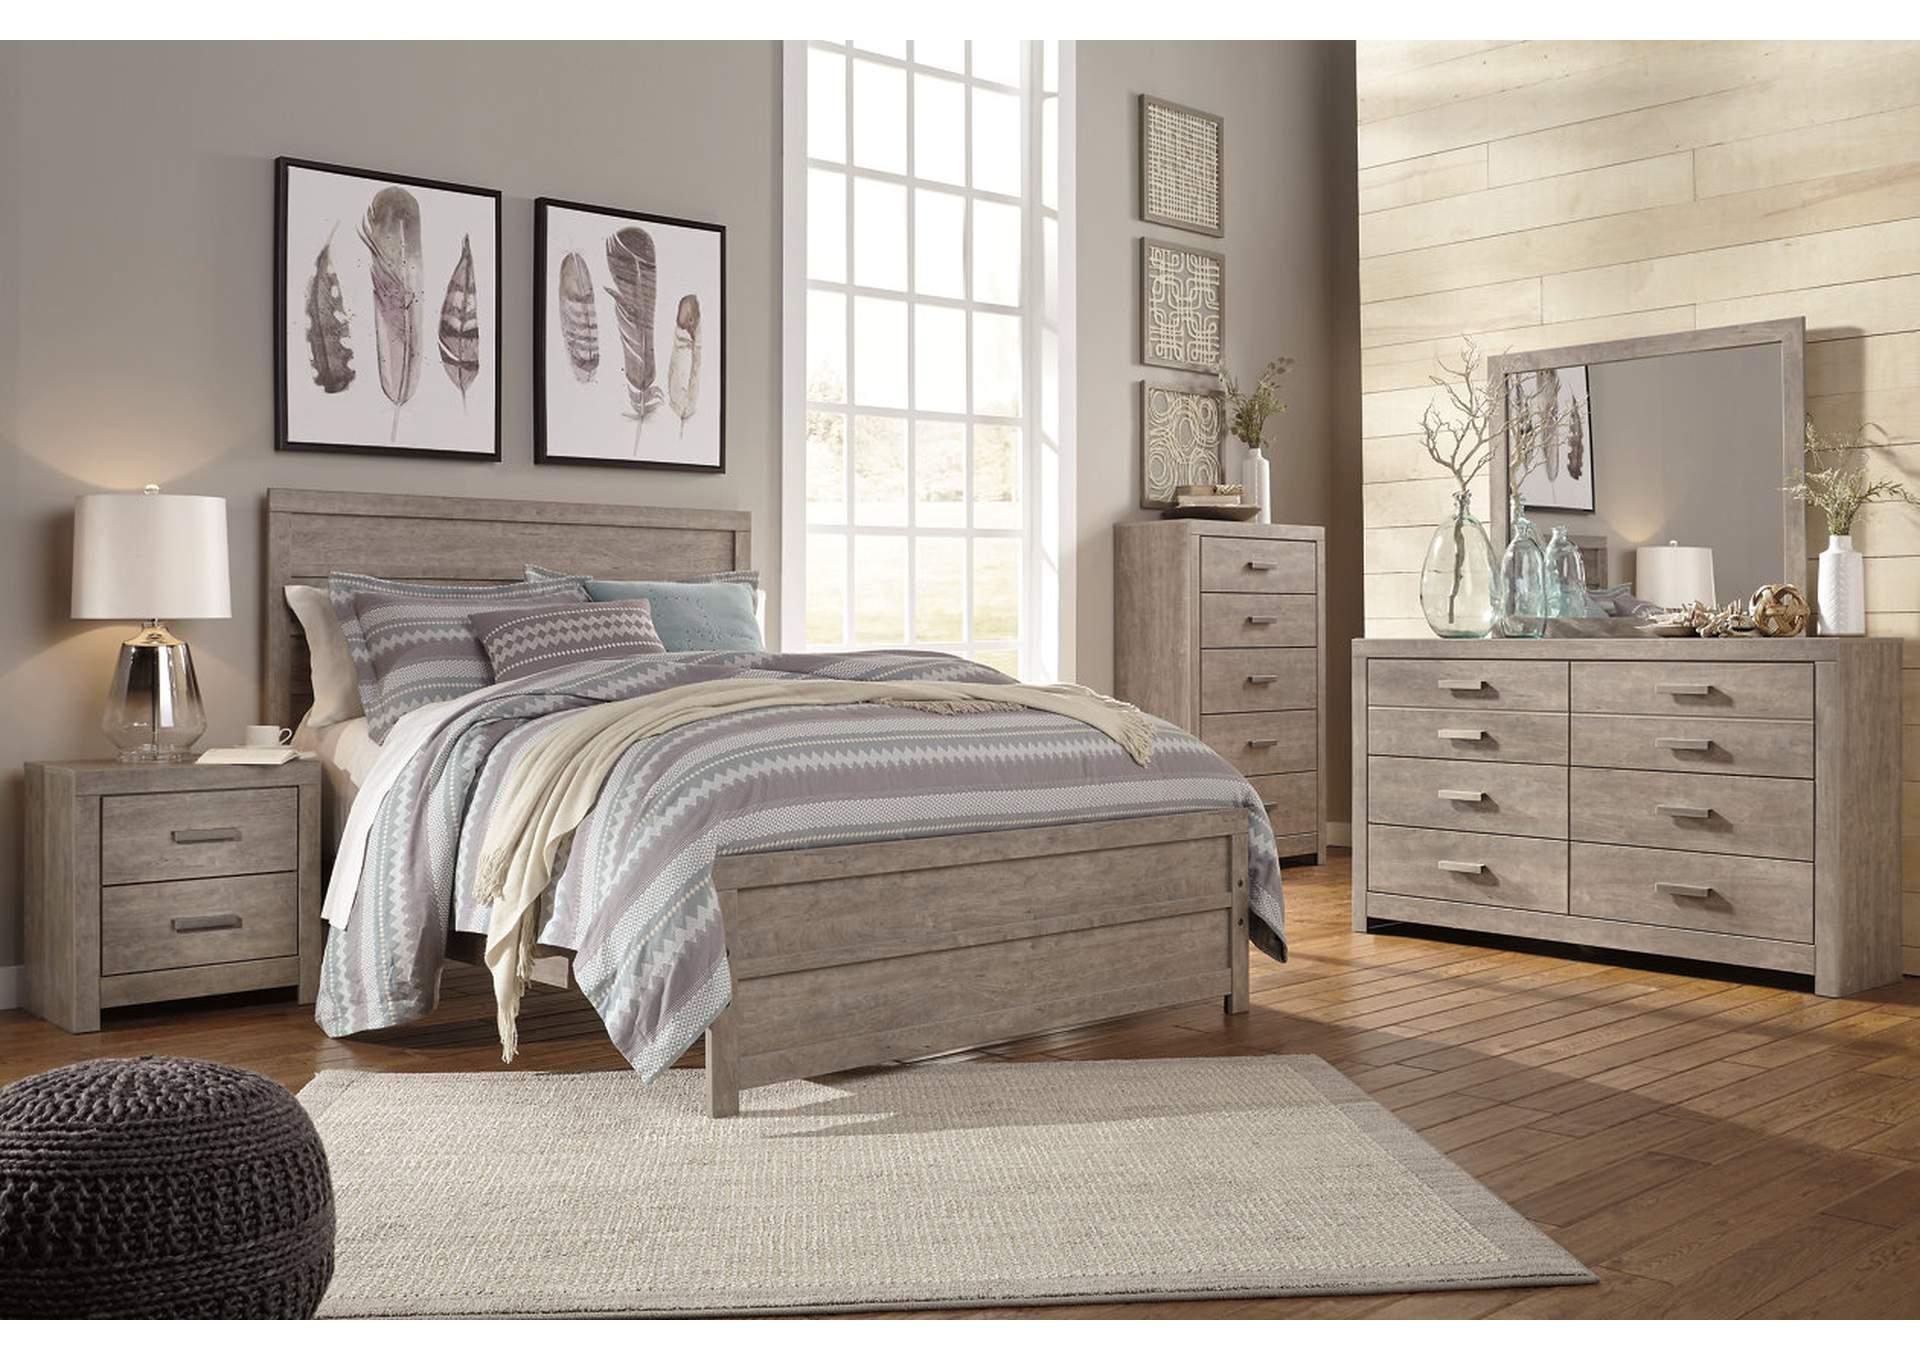 Culverbach Queen Panel Bed w/Dresser and Mirror